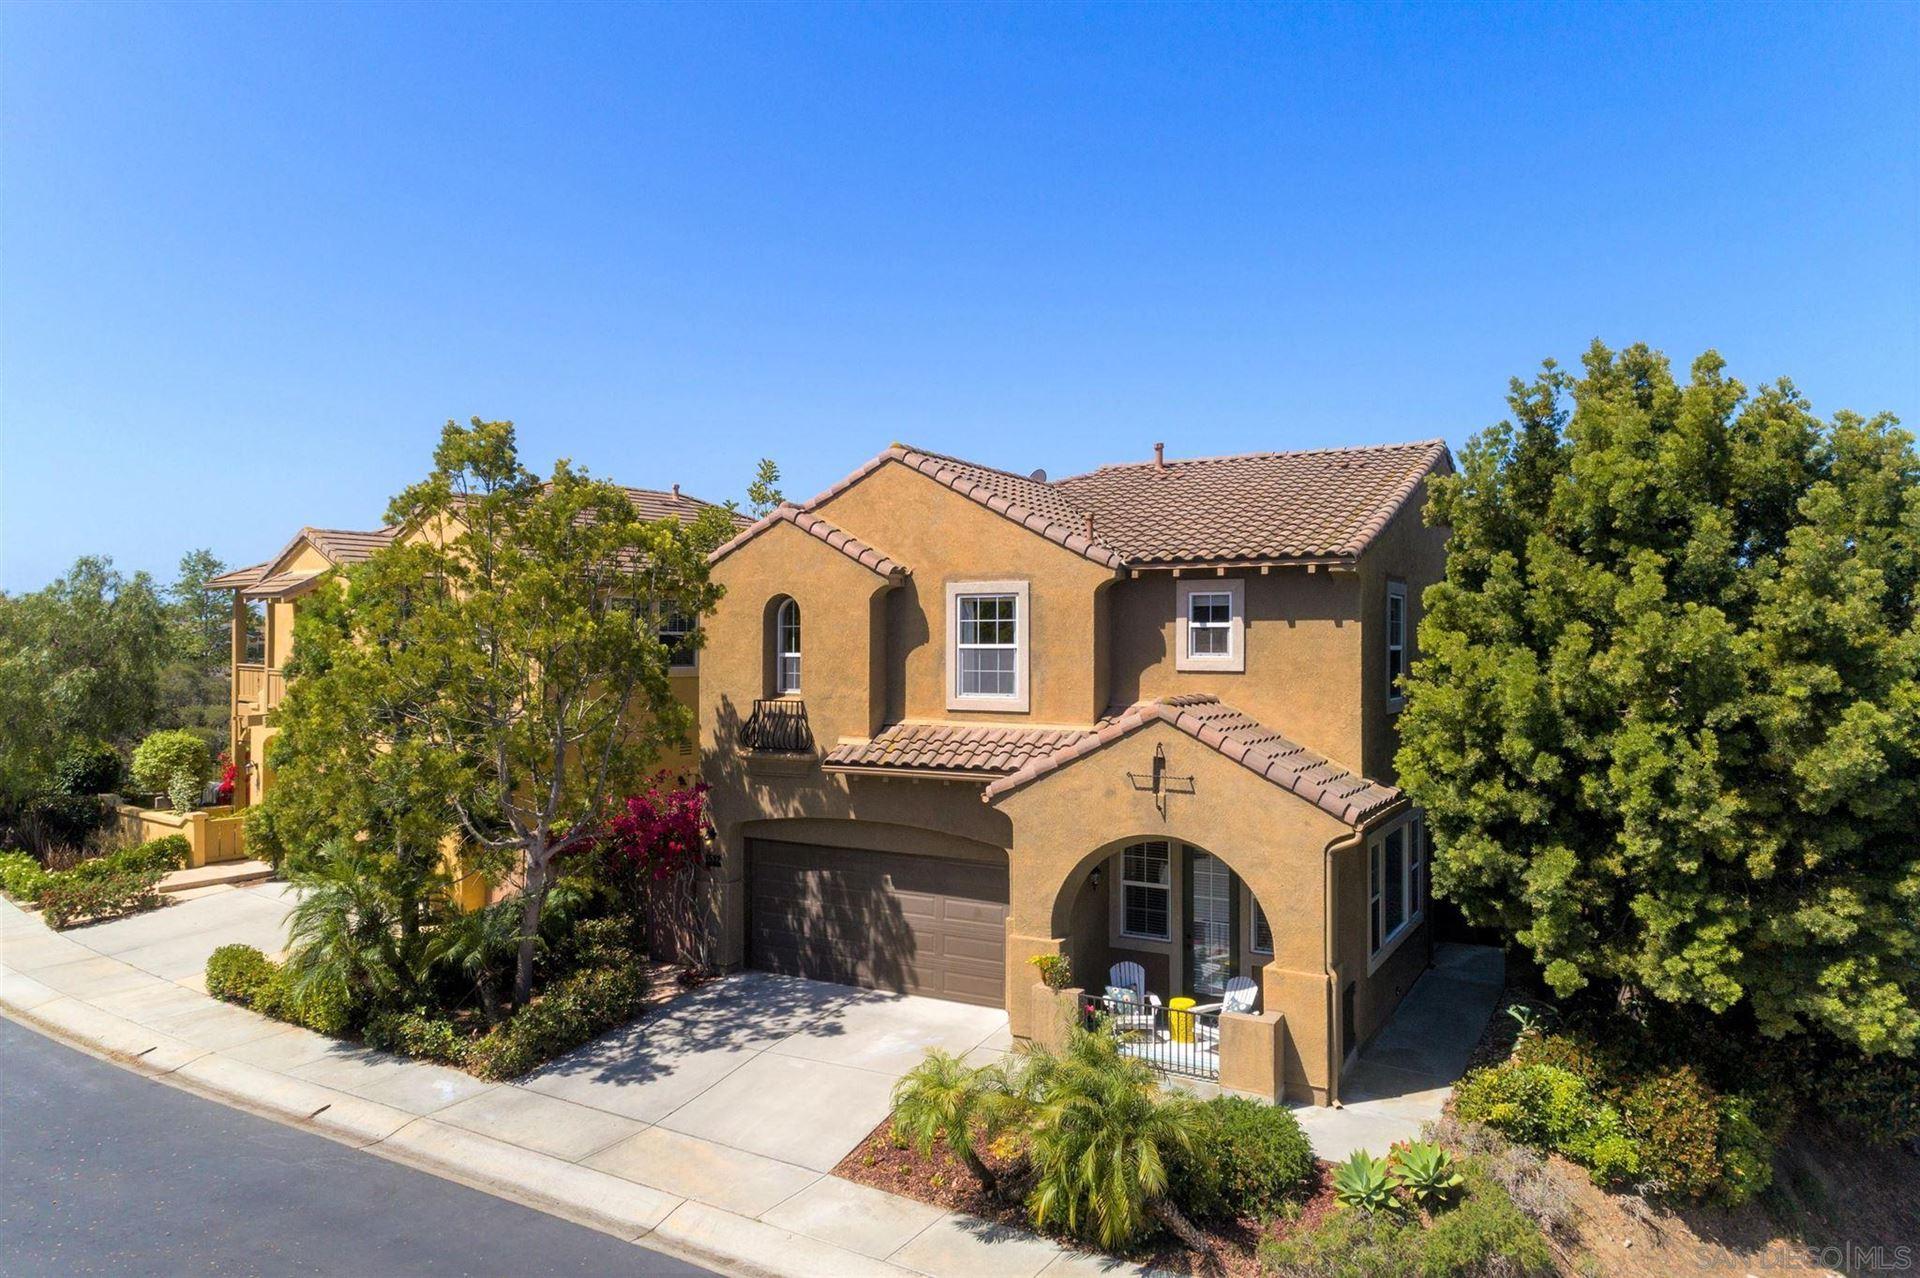 Photo of 1532 Rainey Court, Encinitas, CA 92024 (MLS # 210014541)